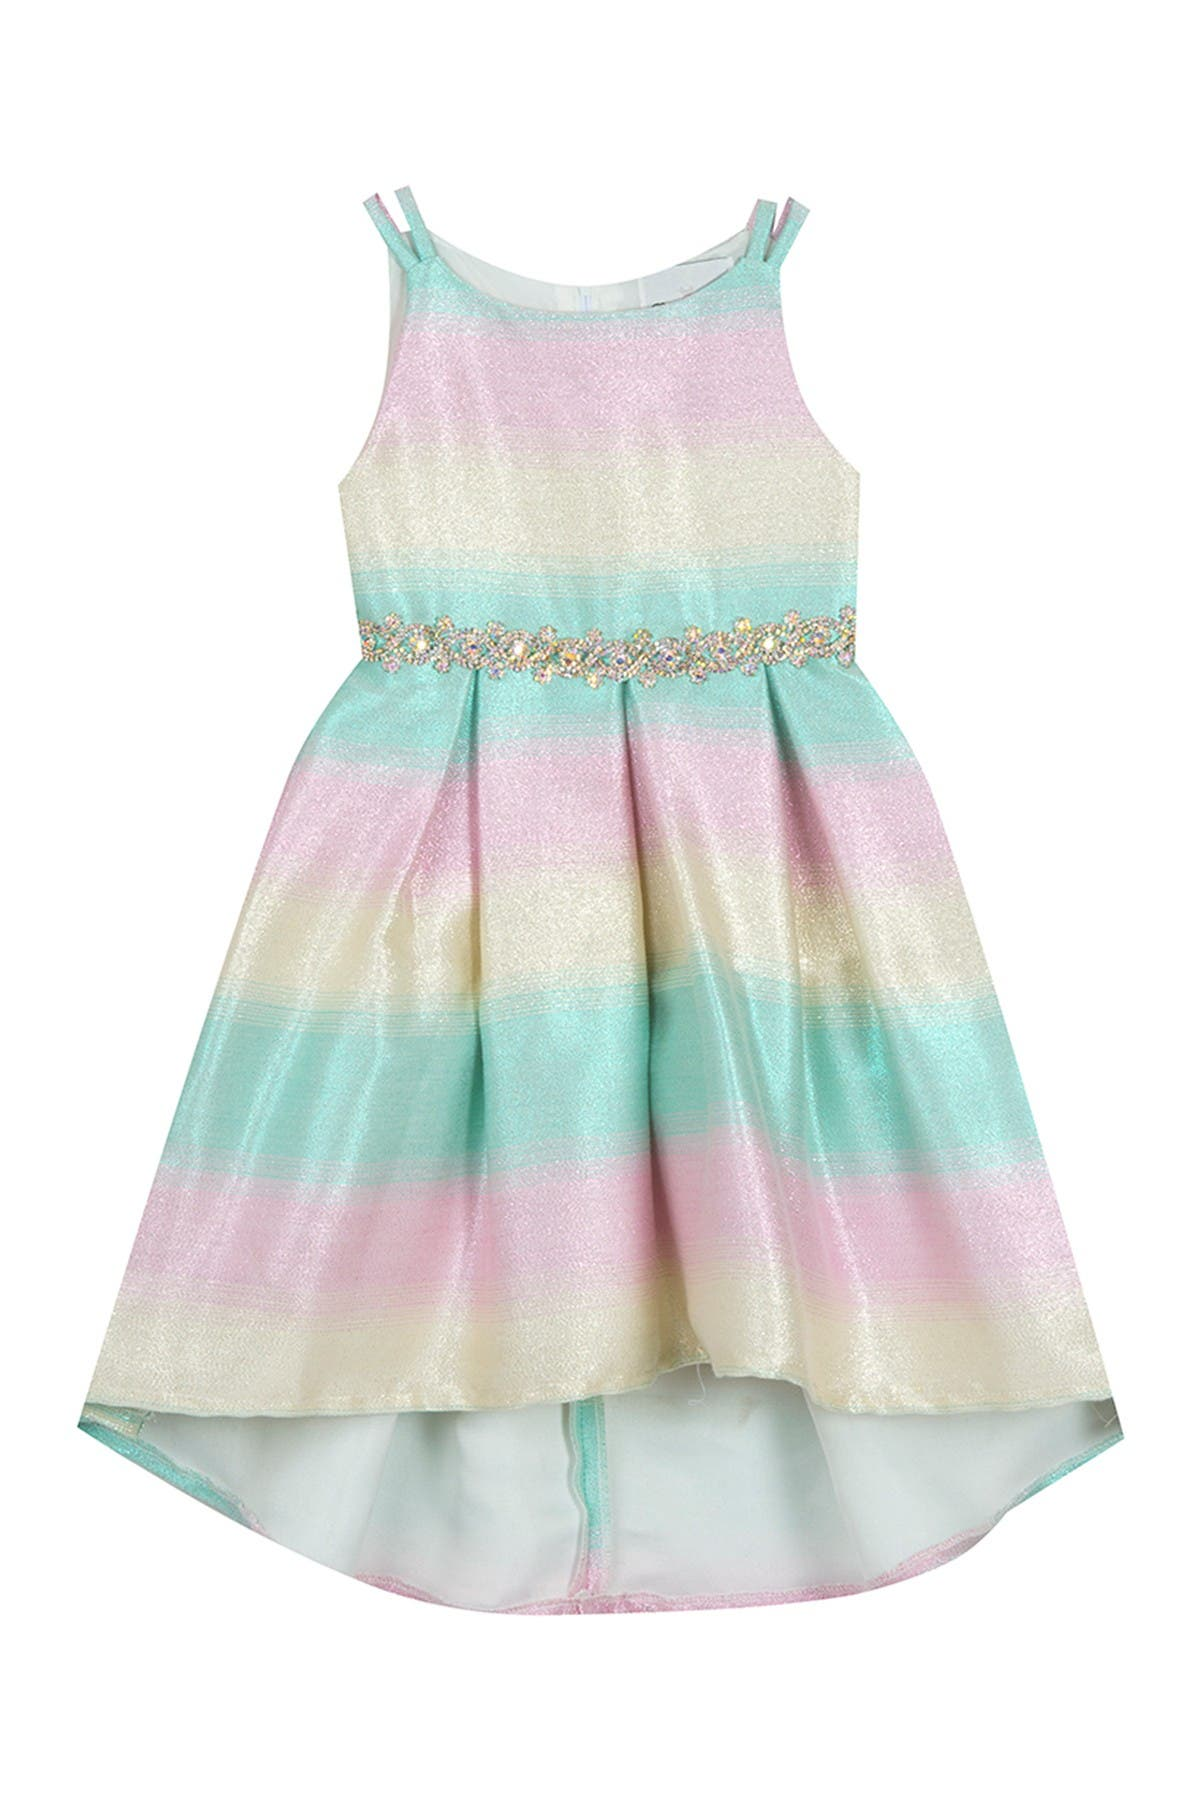 Image of Rare Editions Ombre Jacquard Hi-Low Dress